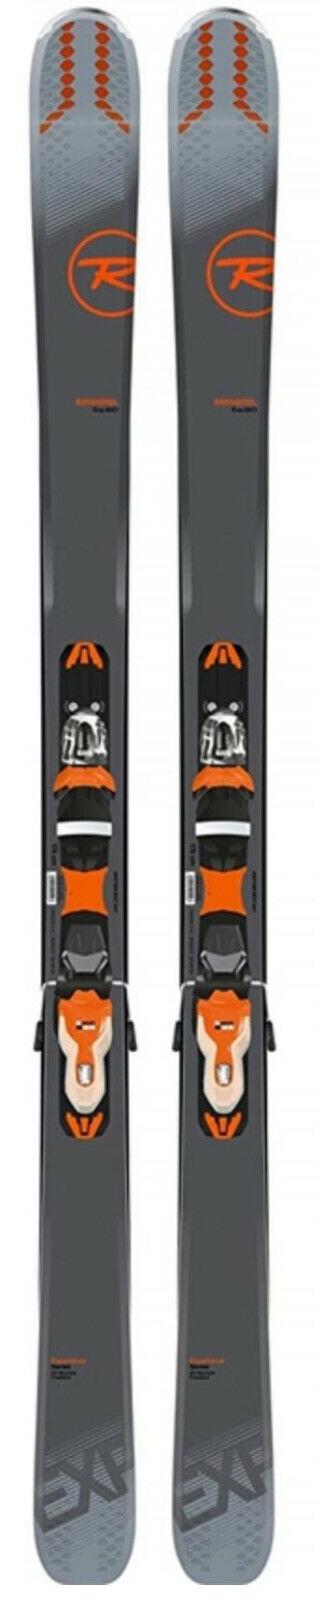 2019 Rossignol 80 CI snow skis 174cm w-Bind (CLEARANCE PRICE) NEW